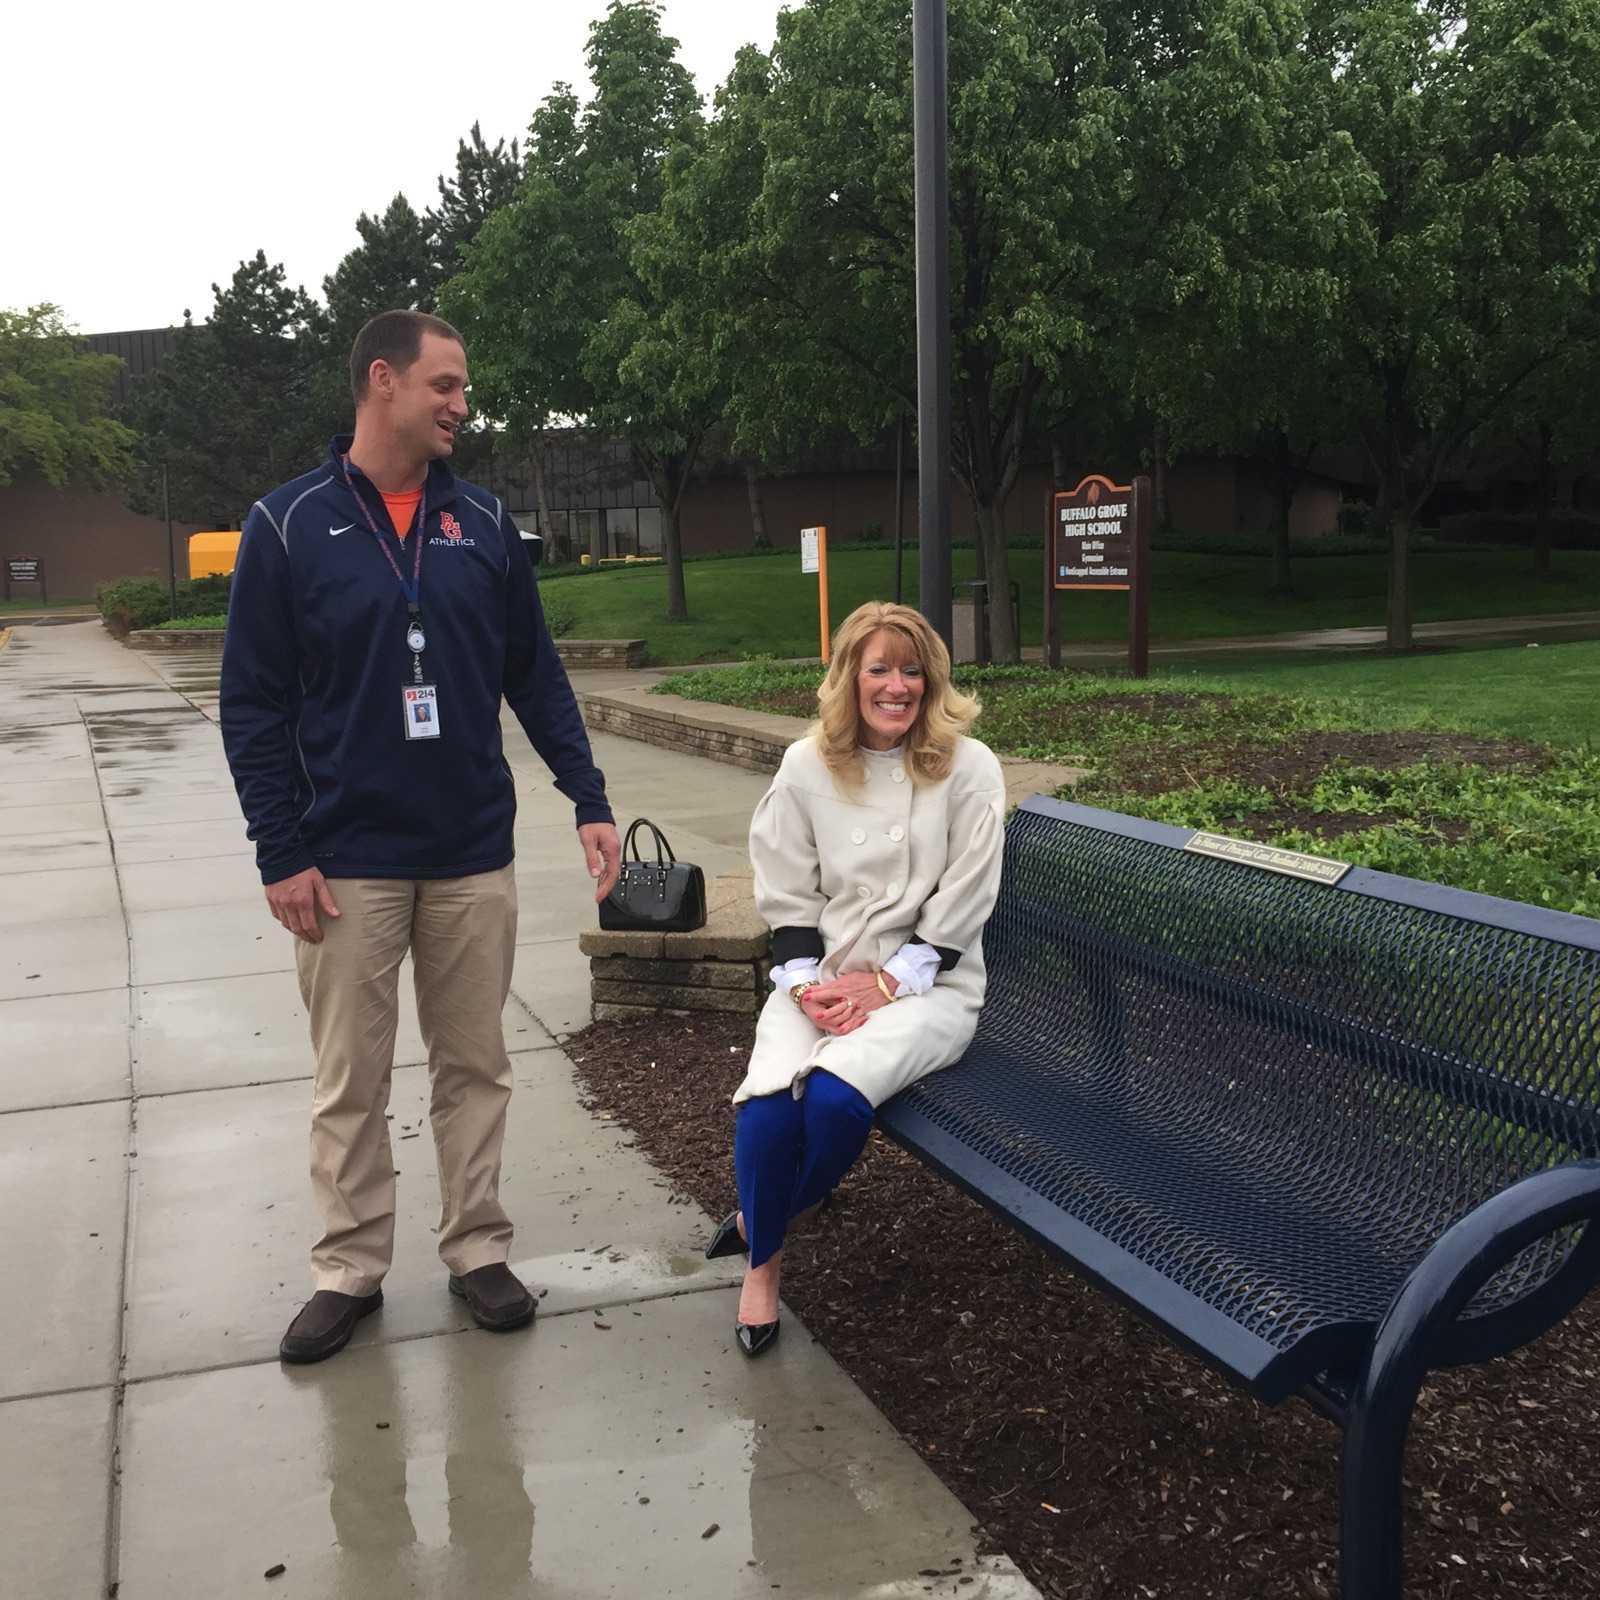 Former BG principal Carol Burlinski sits on honorary bench alongside principal Jeff Wardle.